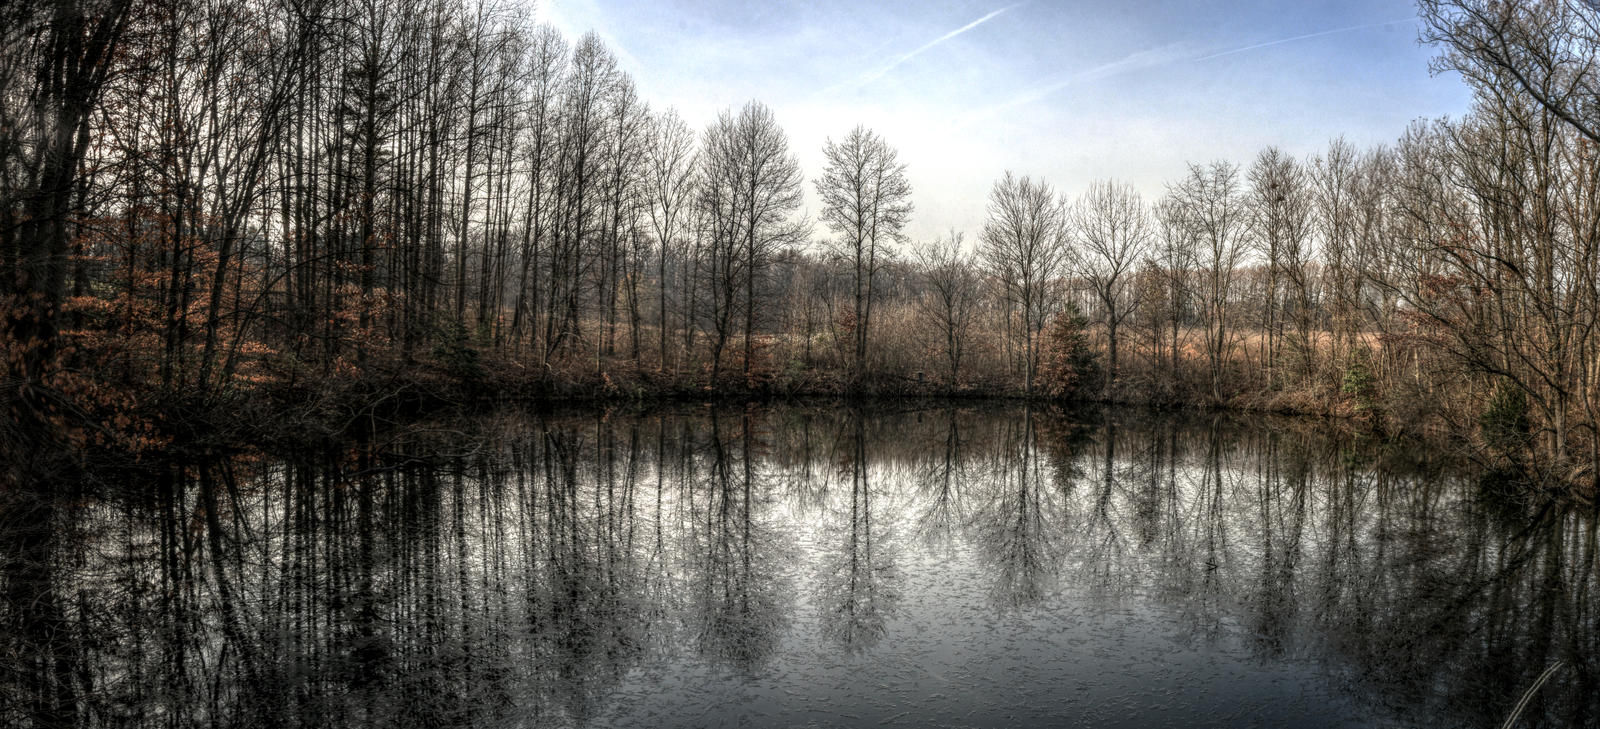 Panorama 3499 hdr pregamma 1 mantiuk06 contrast ma